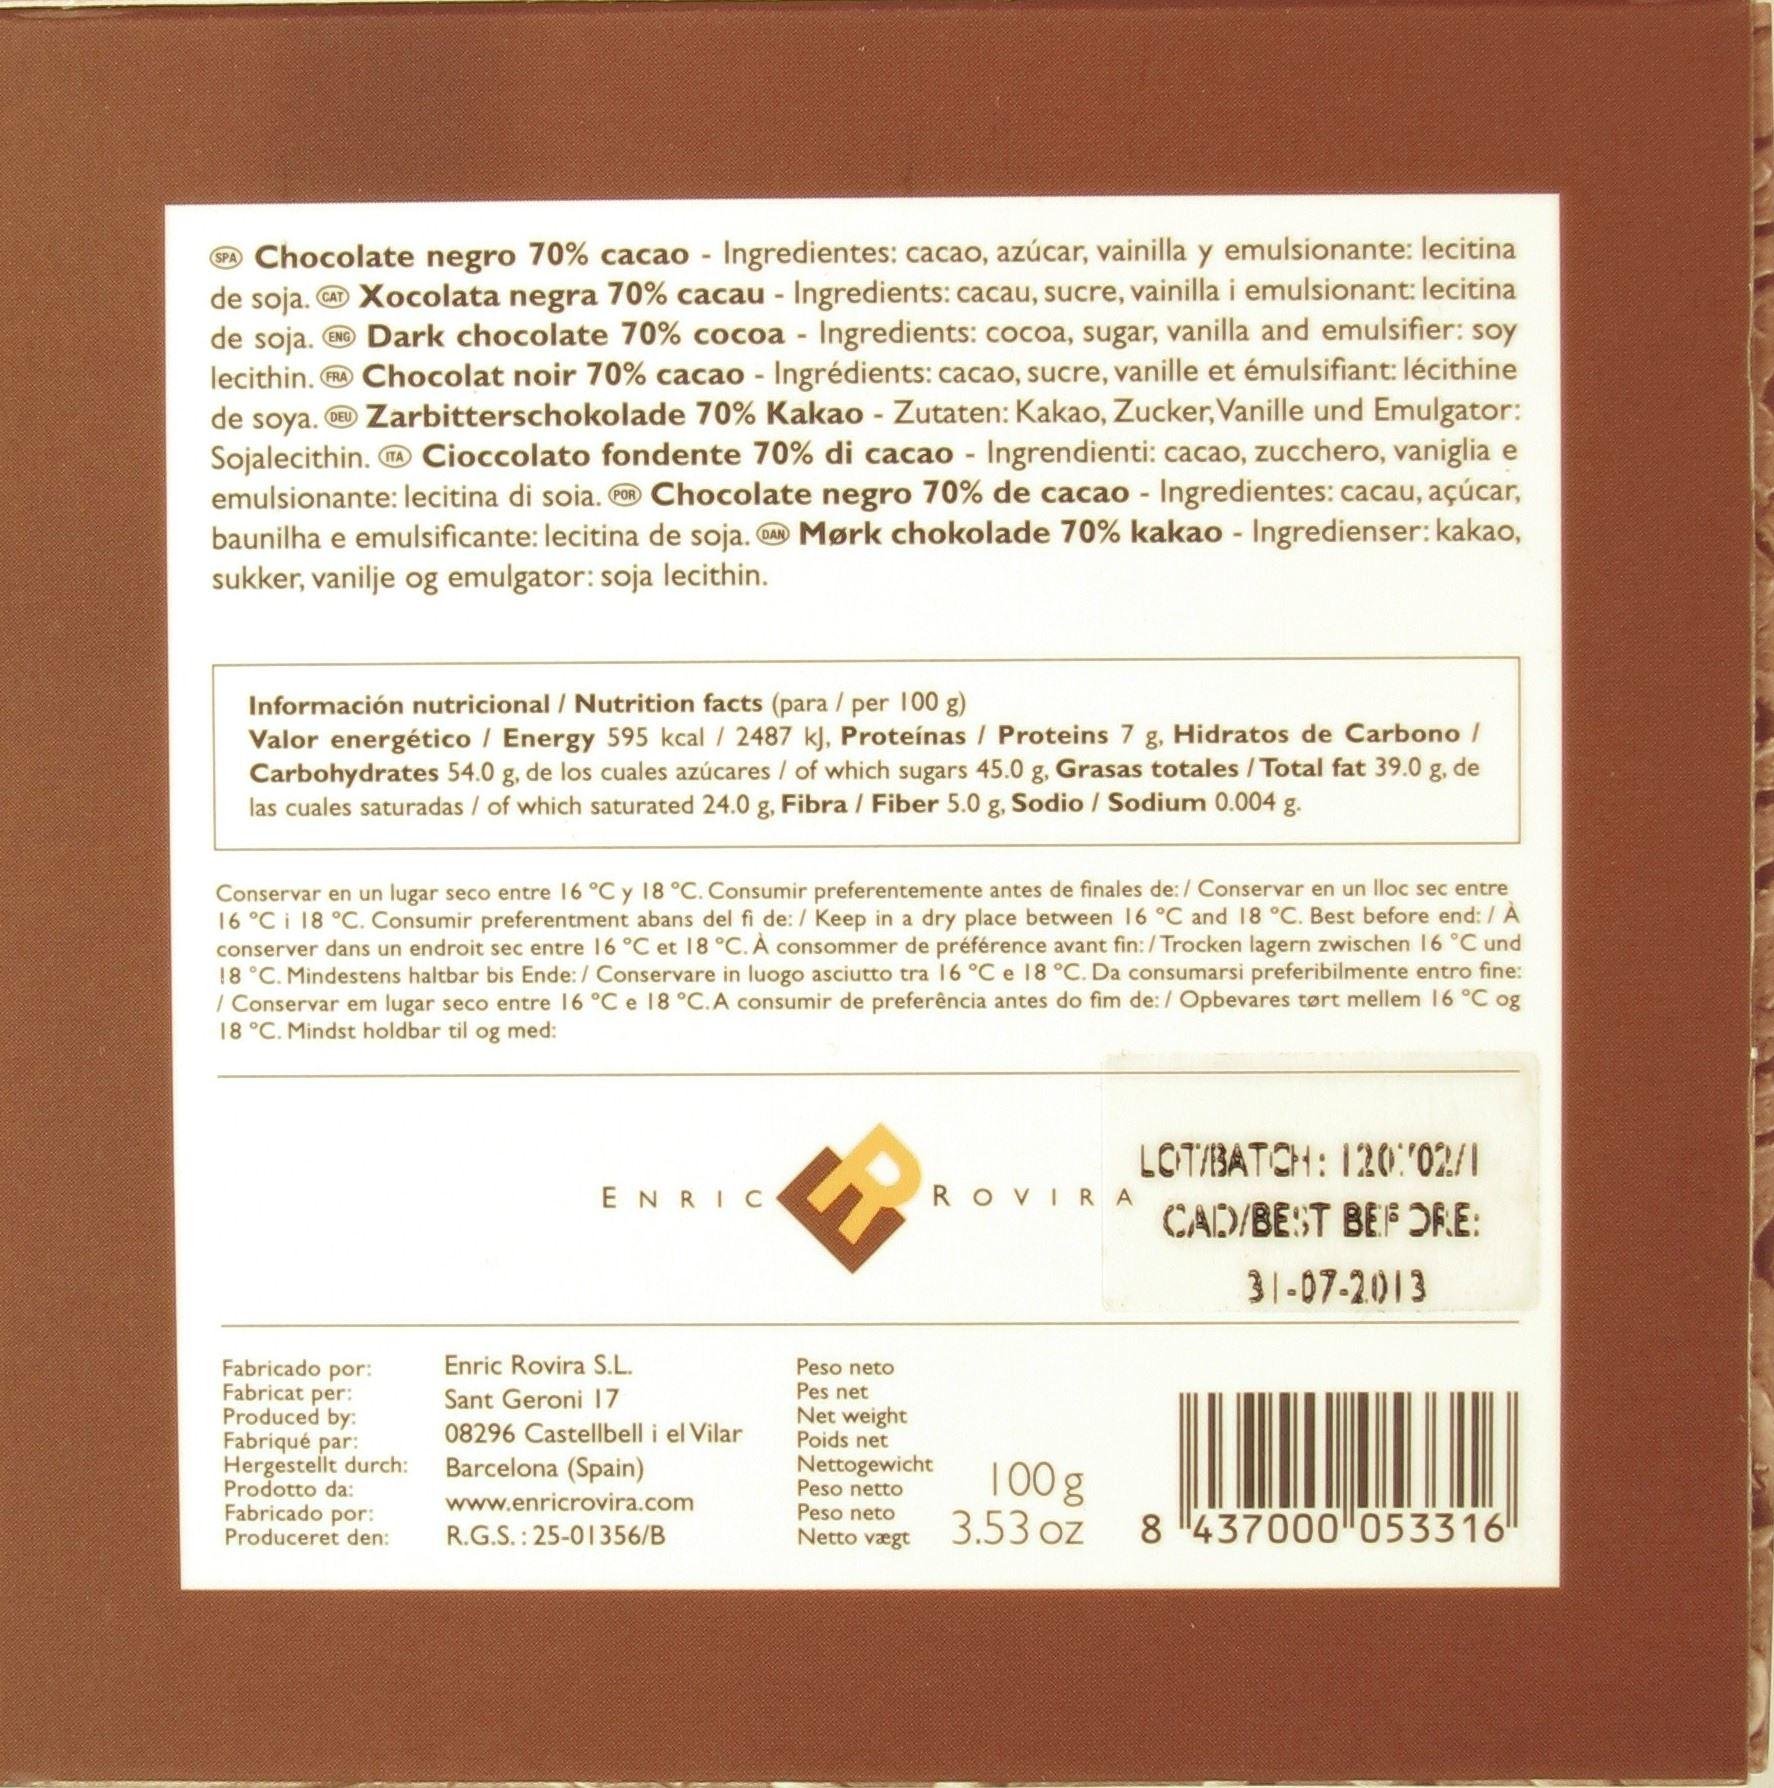 Dunkle Tafelschokolade Enric Rovira, Barcelona - Inhaltsangaben